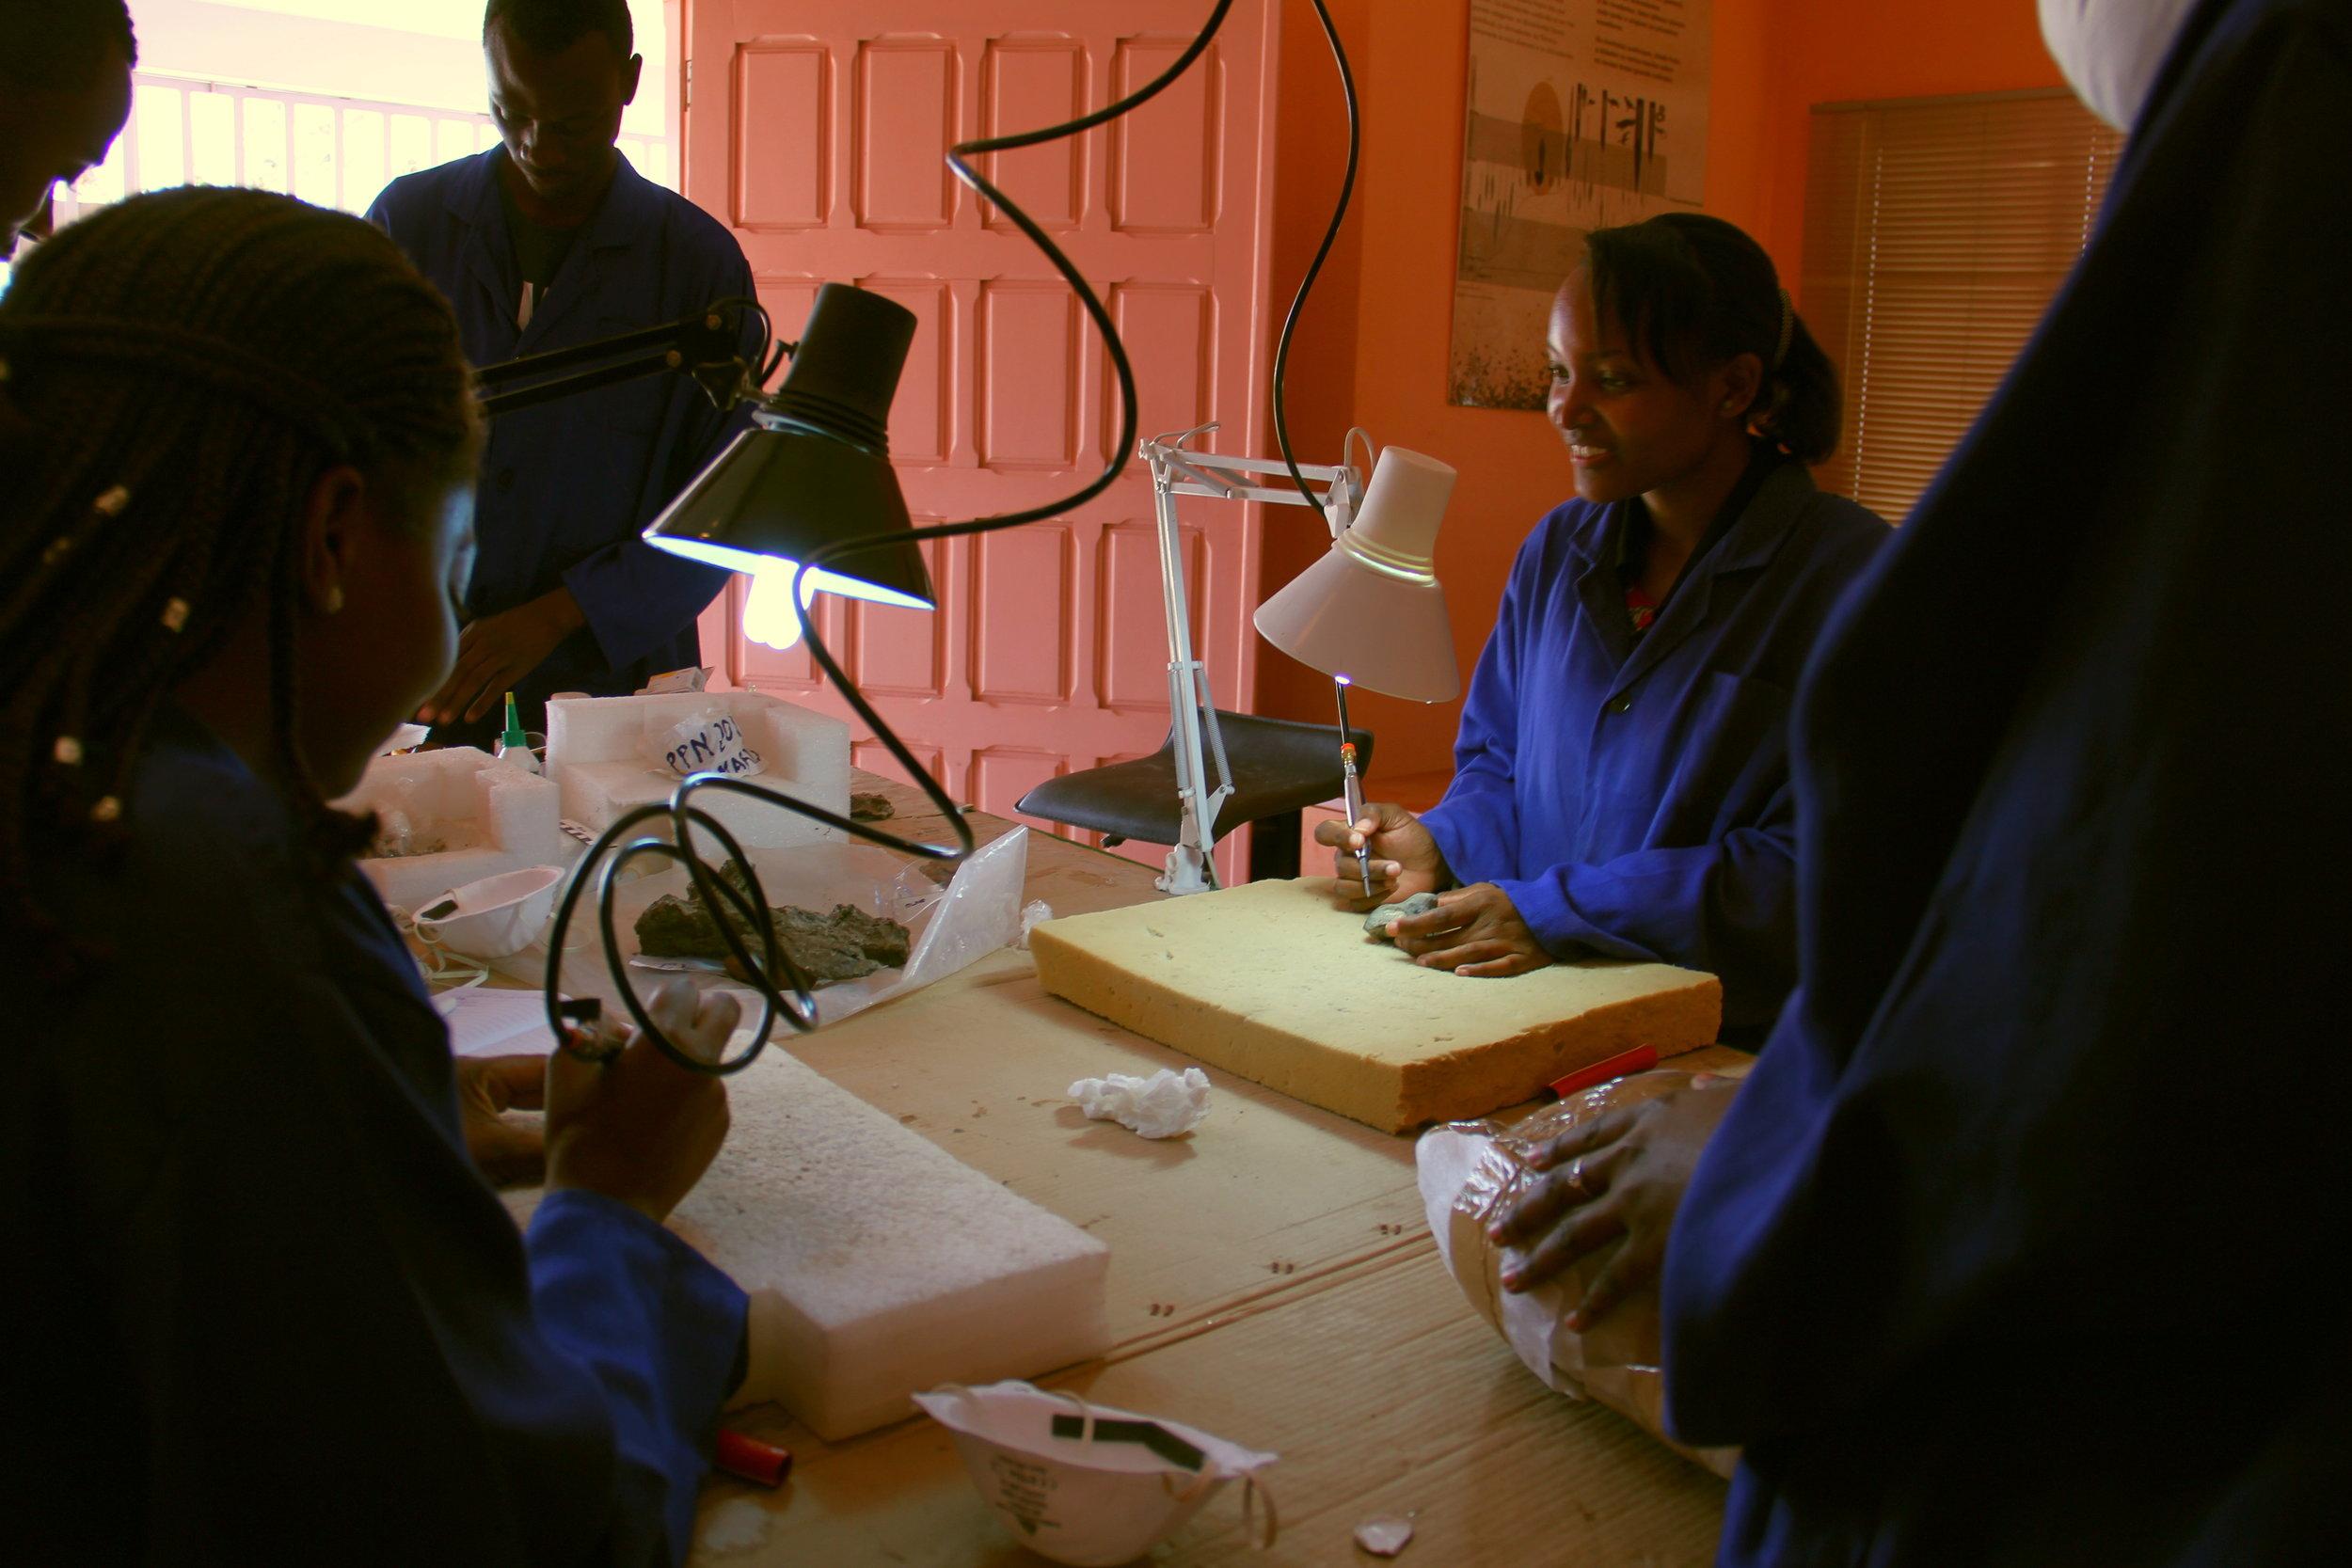 Paleontology students preparing fossils from Niassa at the National Paleontology Laboratory in Maputo.